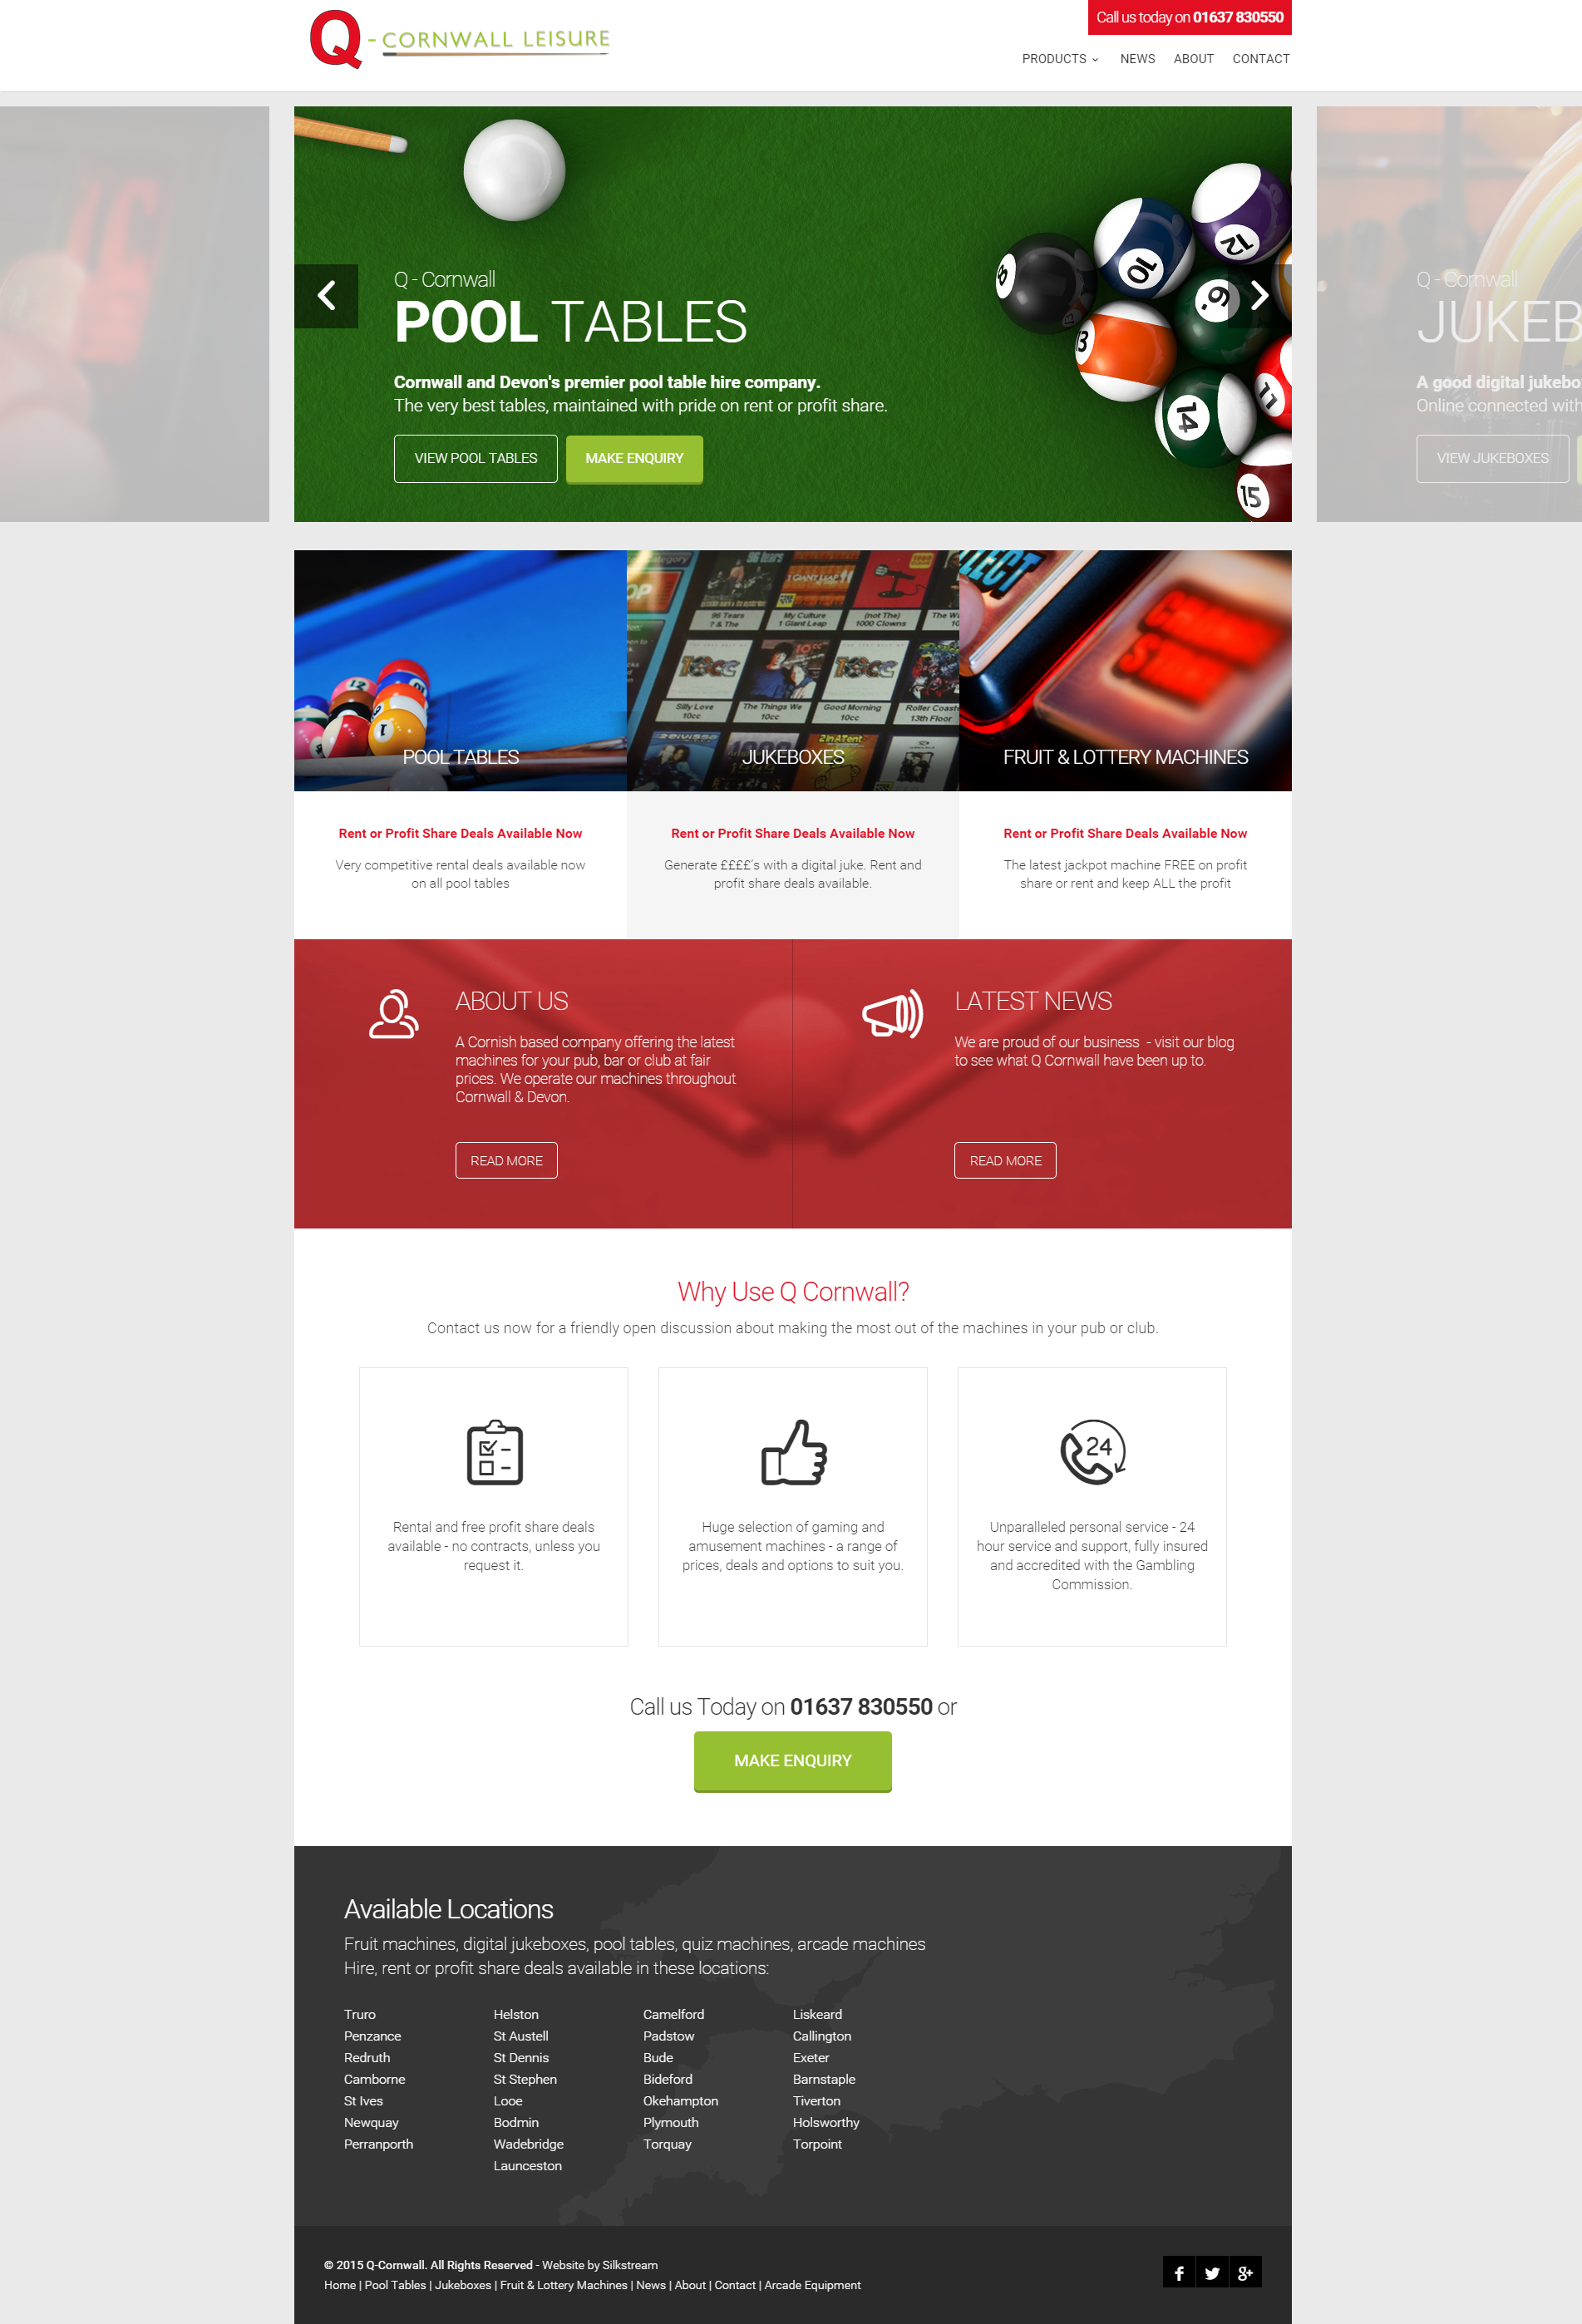 Q-Cornwall's new web design